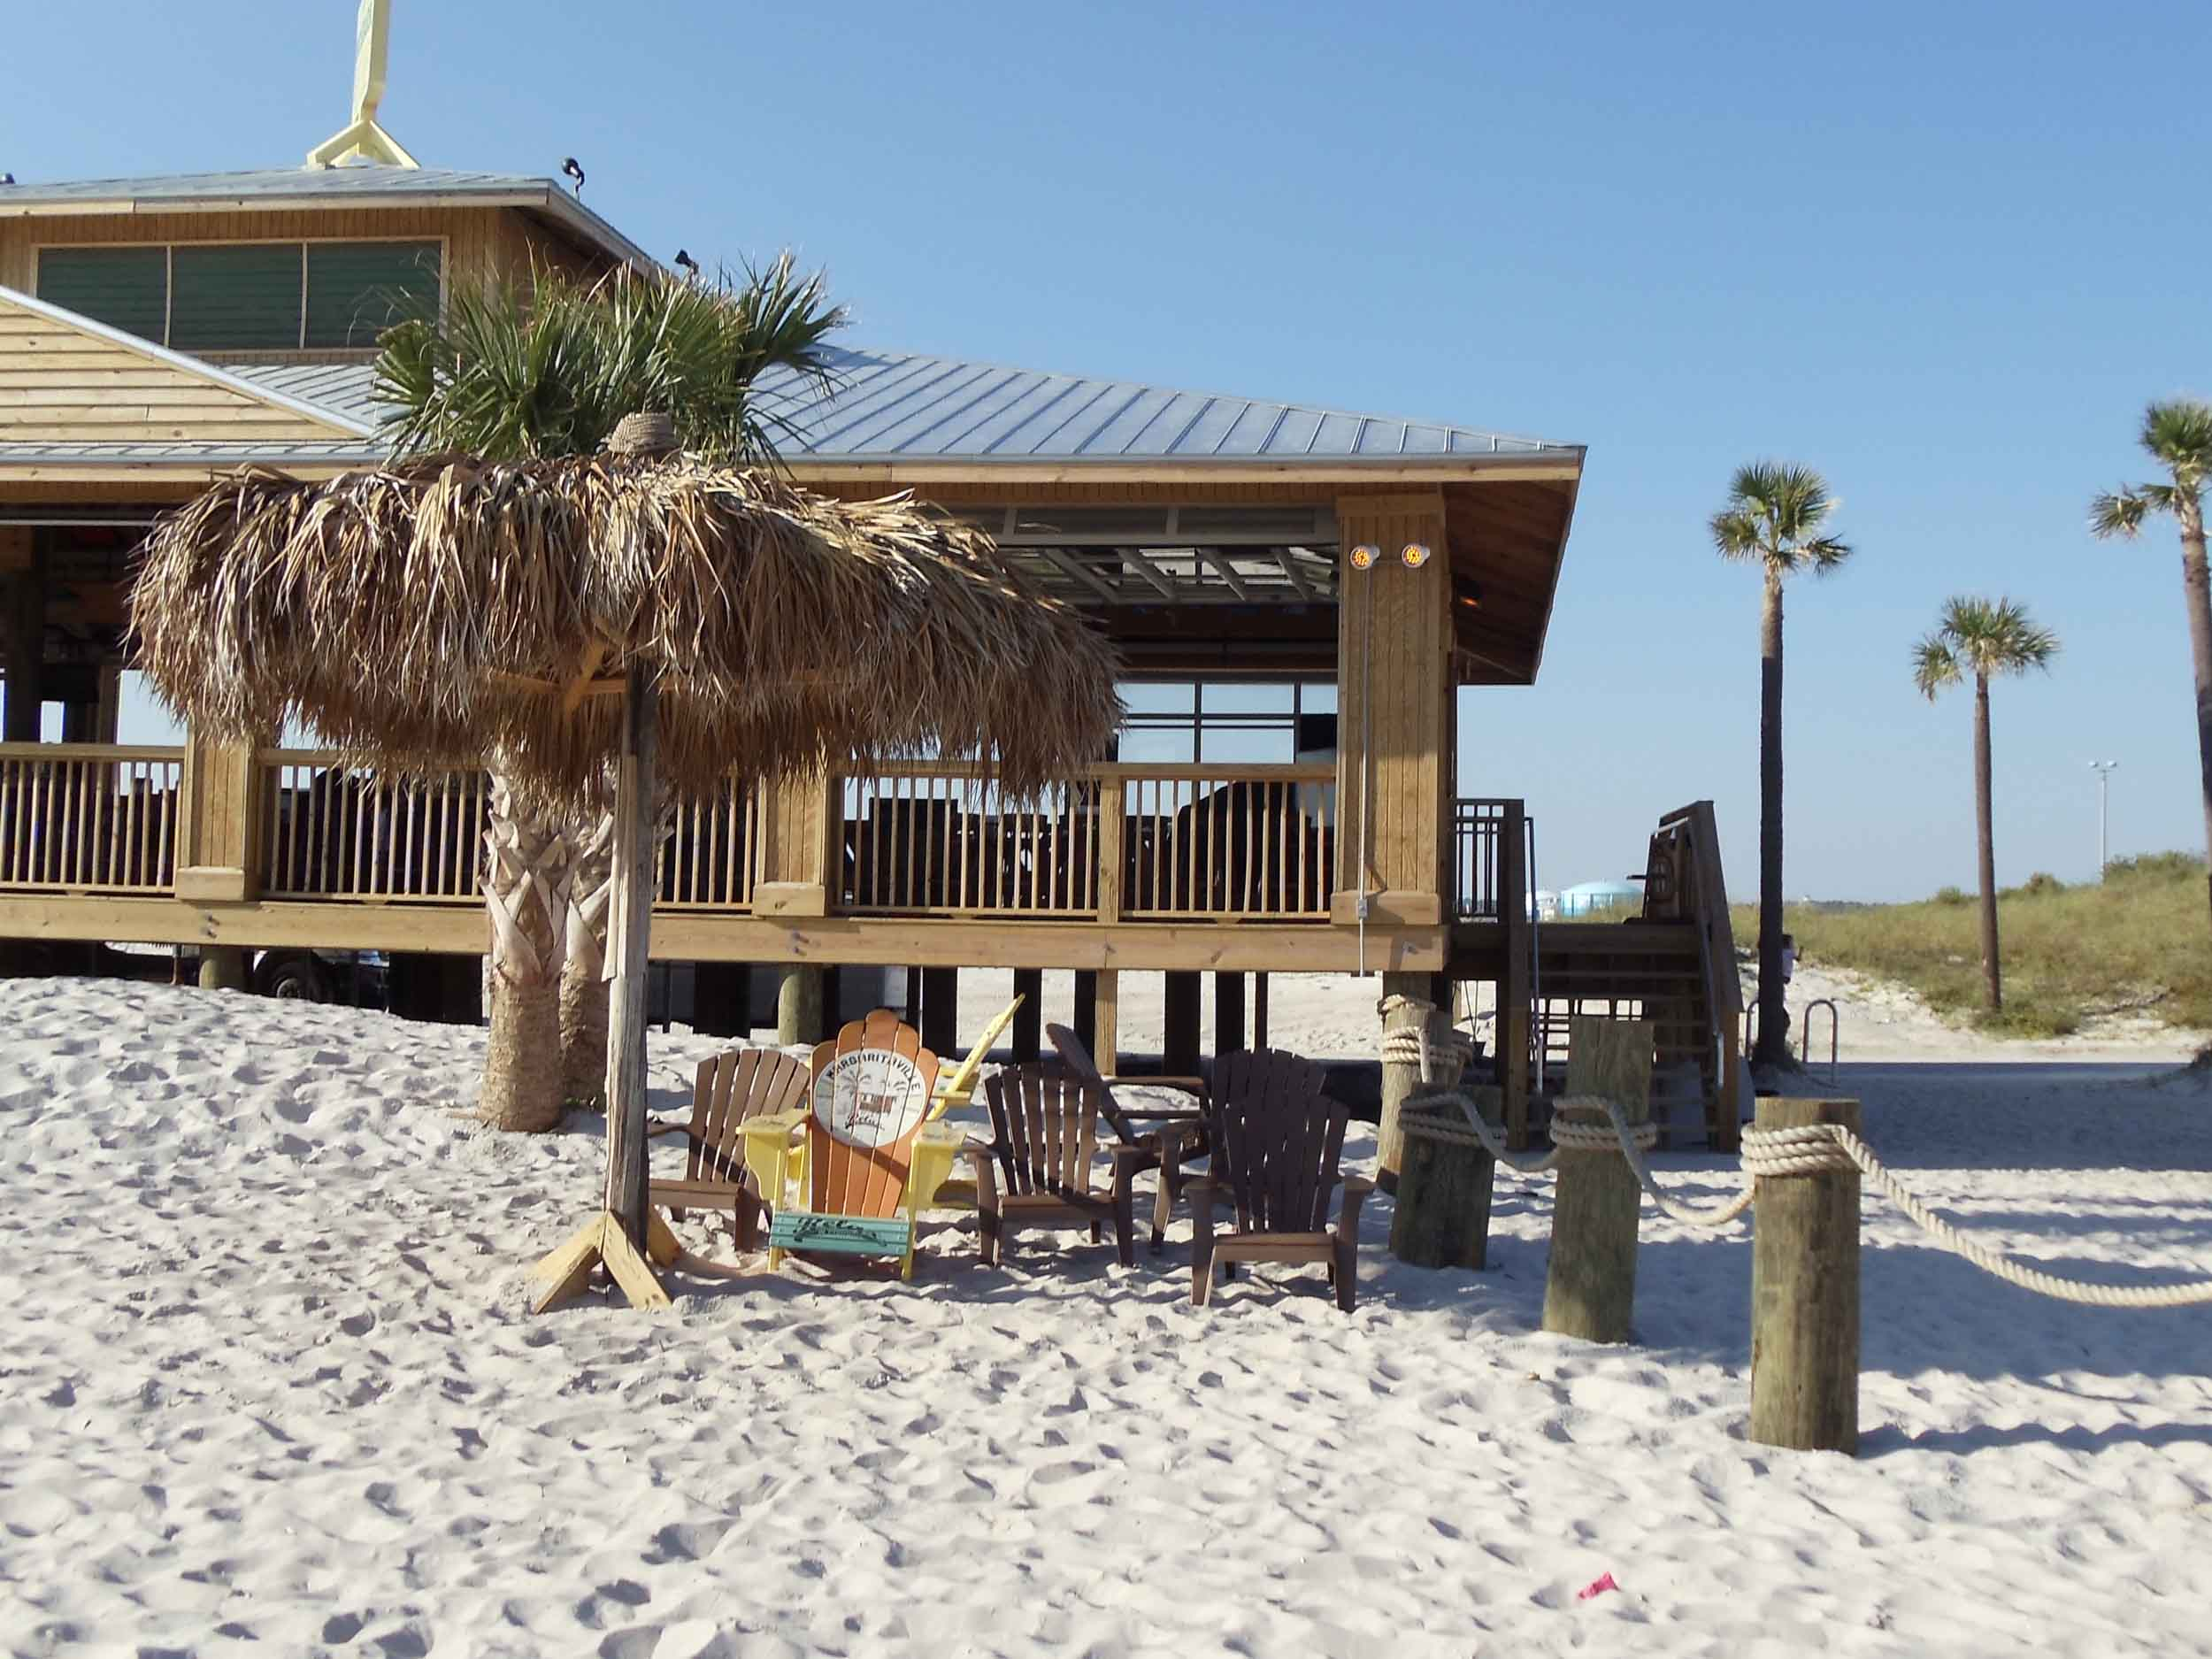 LandShark Landing Beach Bar Chairs in the Sand